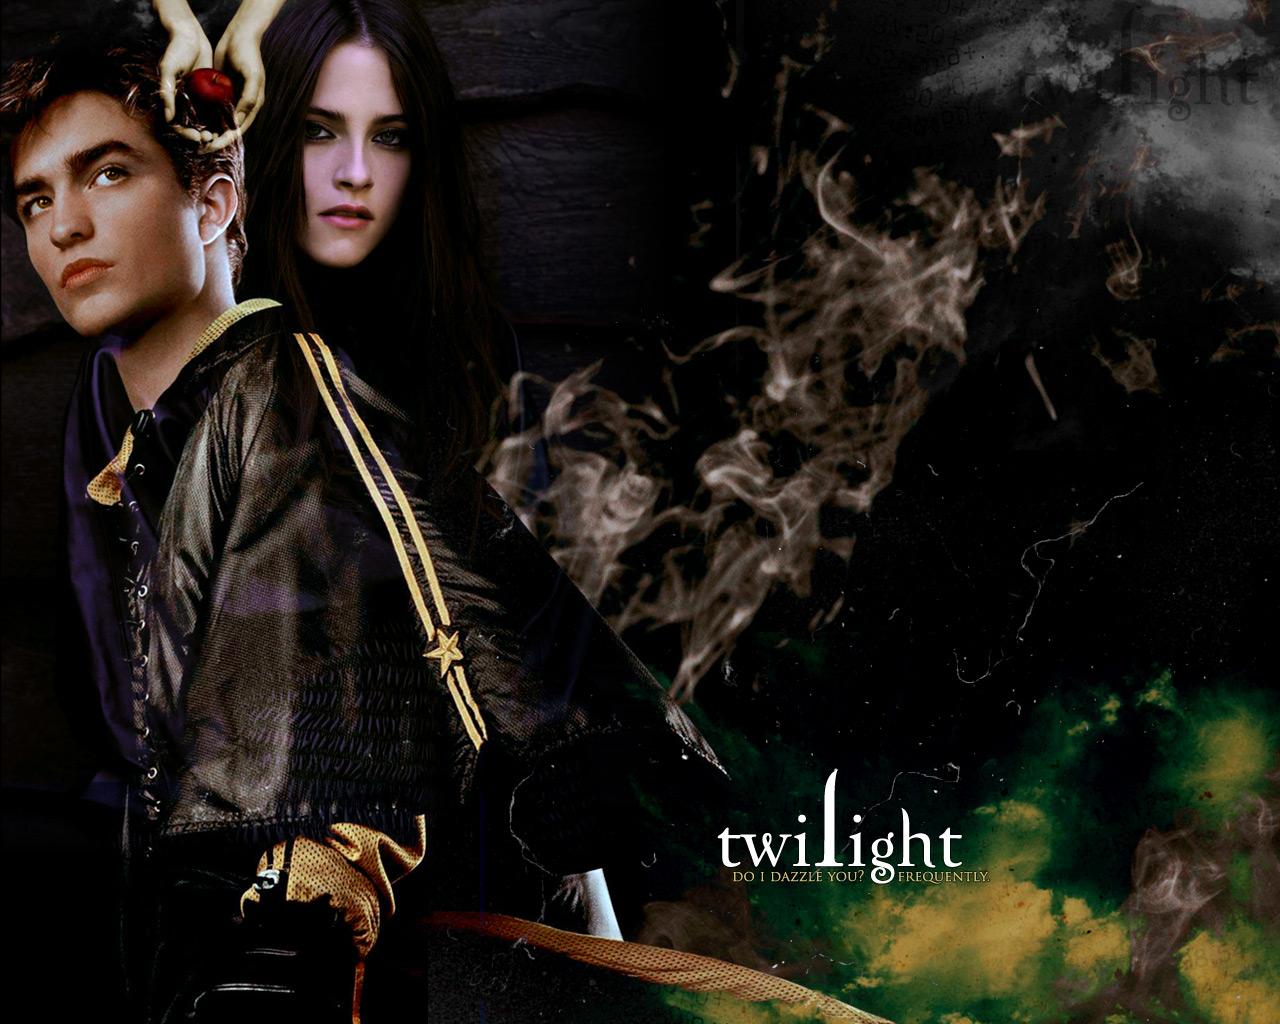 wallpapers Twilight-wallpaper-twilight-series-787124_1280_1024